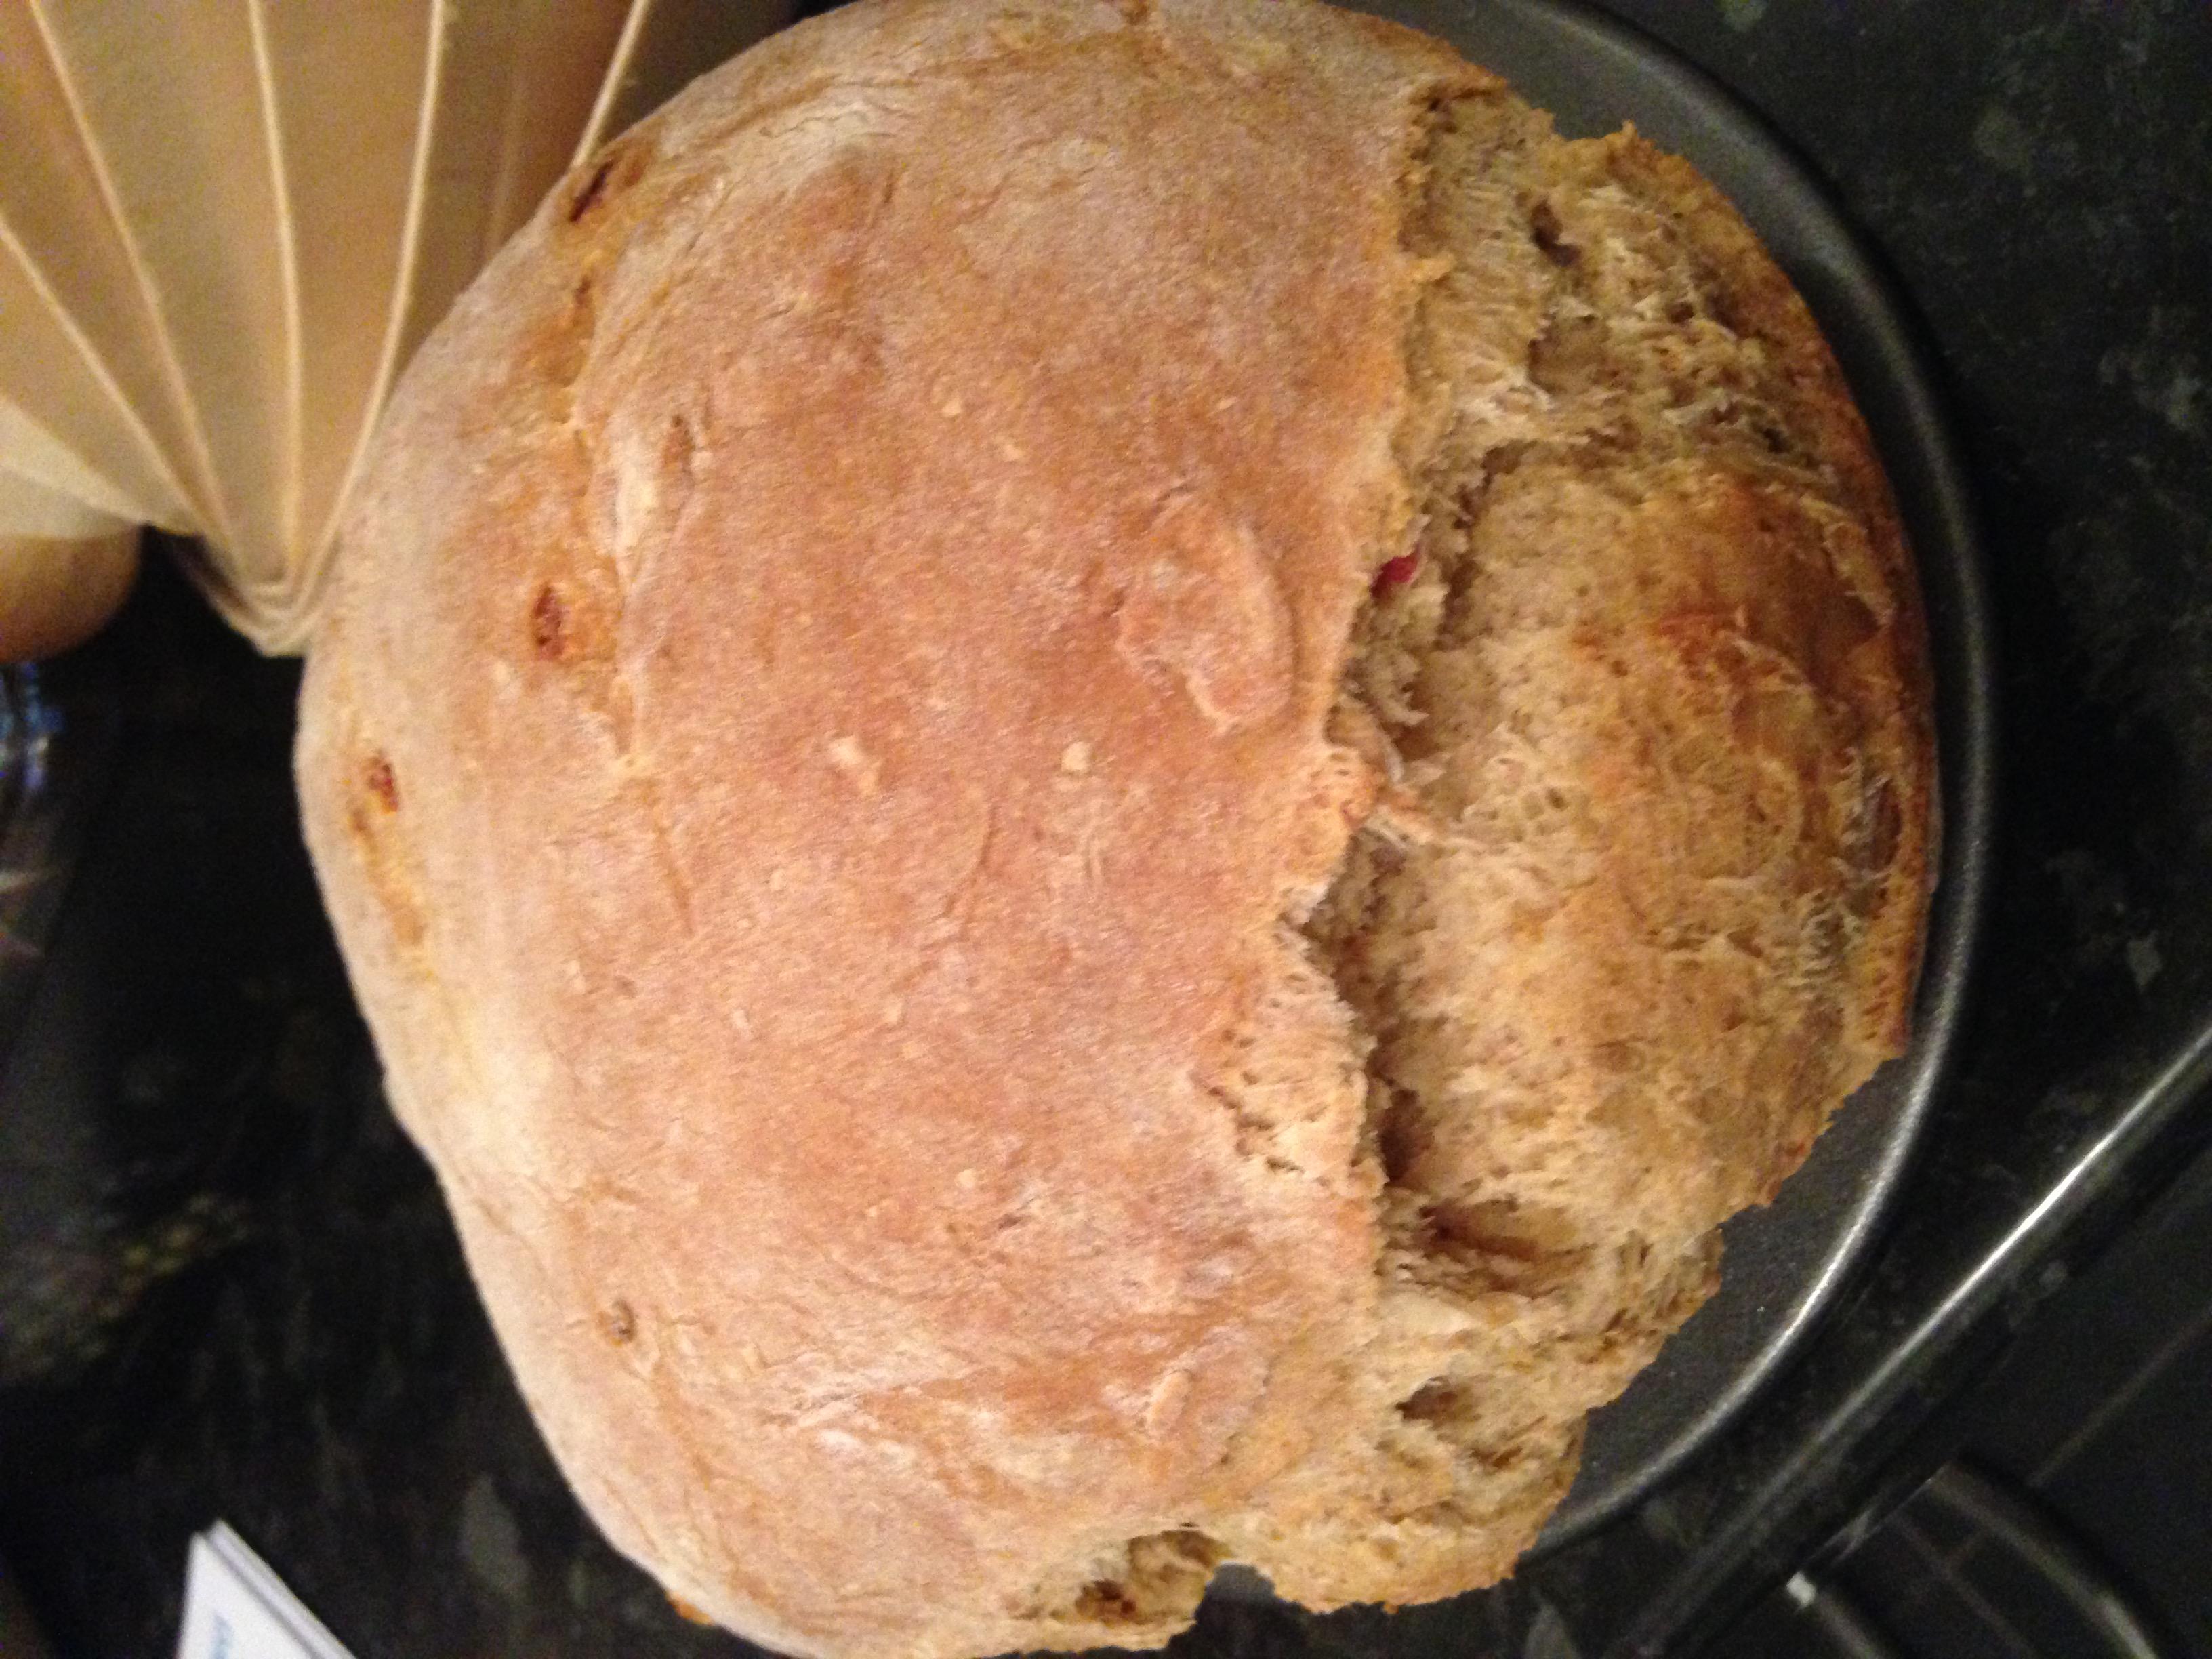 I made Jamie's Loaf